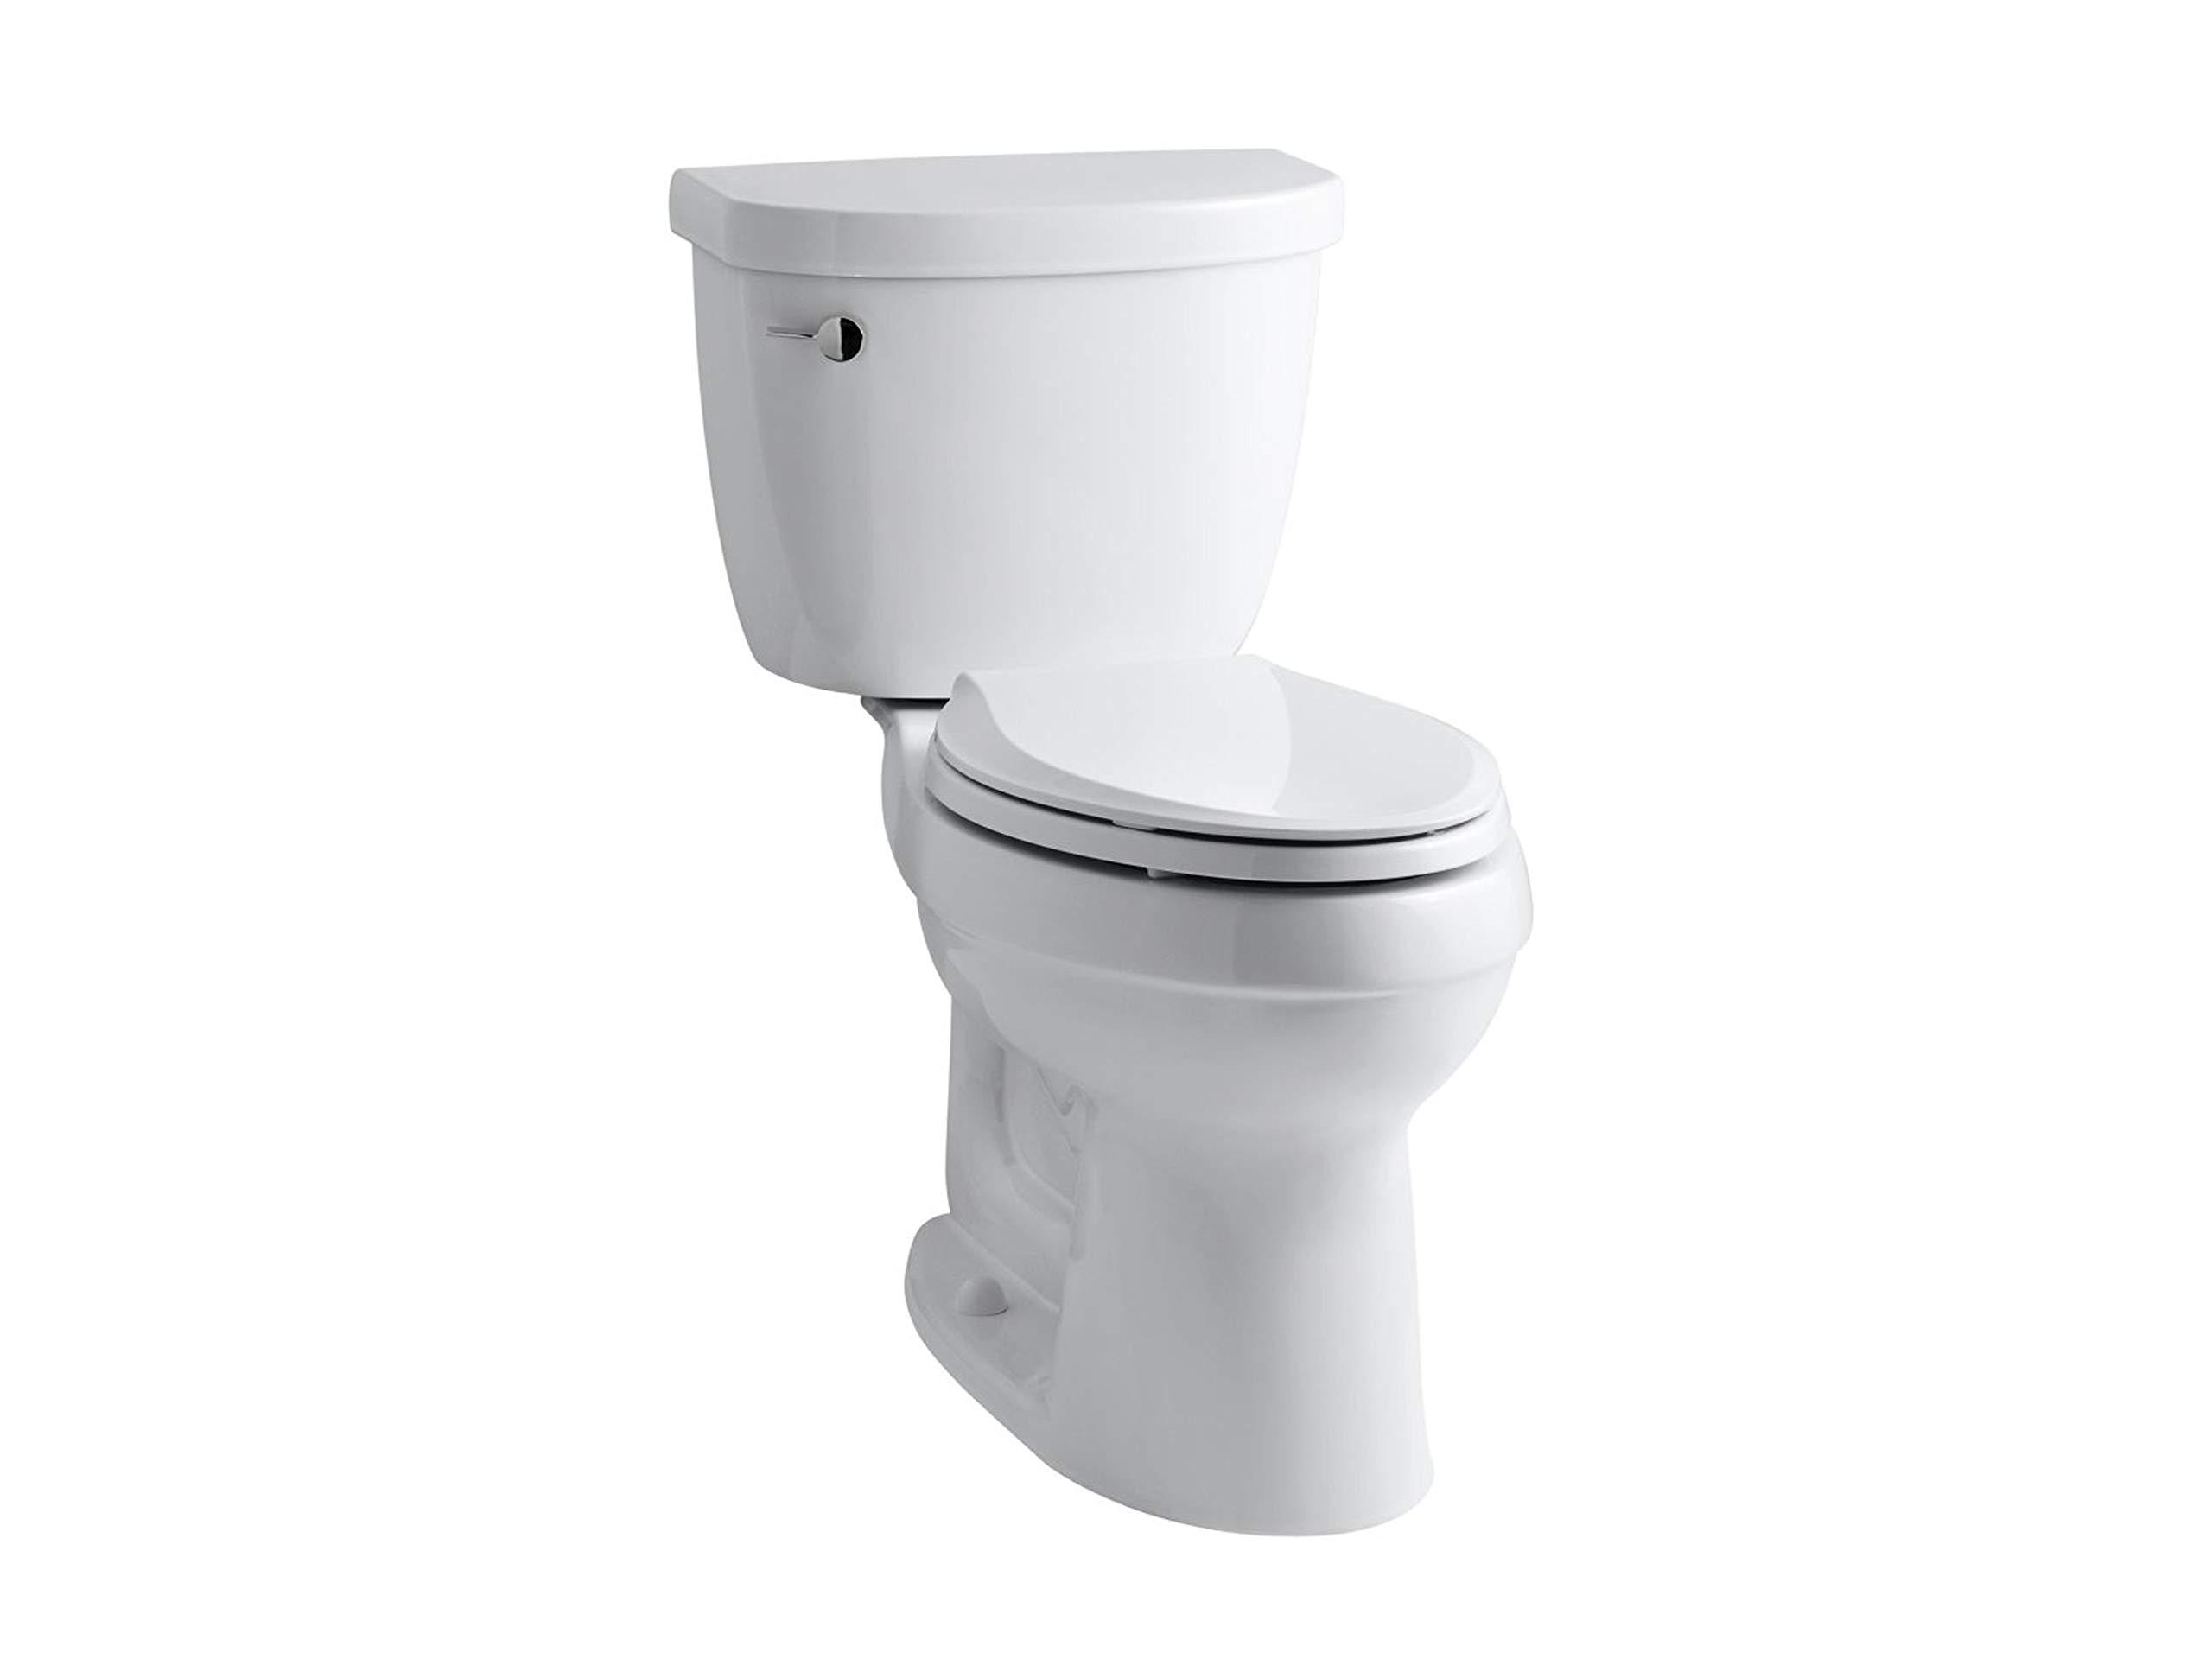 Kohler K-3589-0 Cimarron Comfort Height Elongated 1.6 gpf Toilet with AquaPiston Technology, Less Seat, White by Kohler